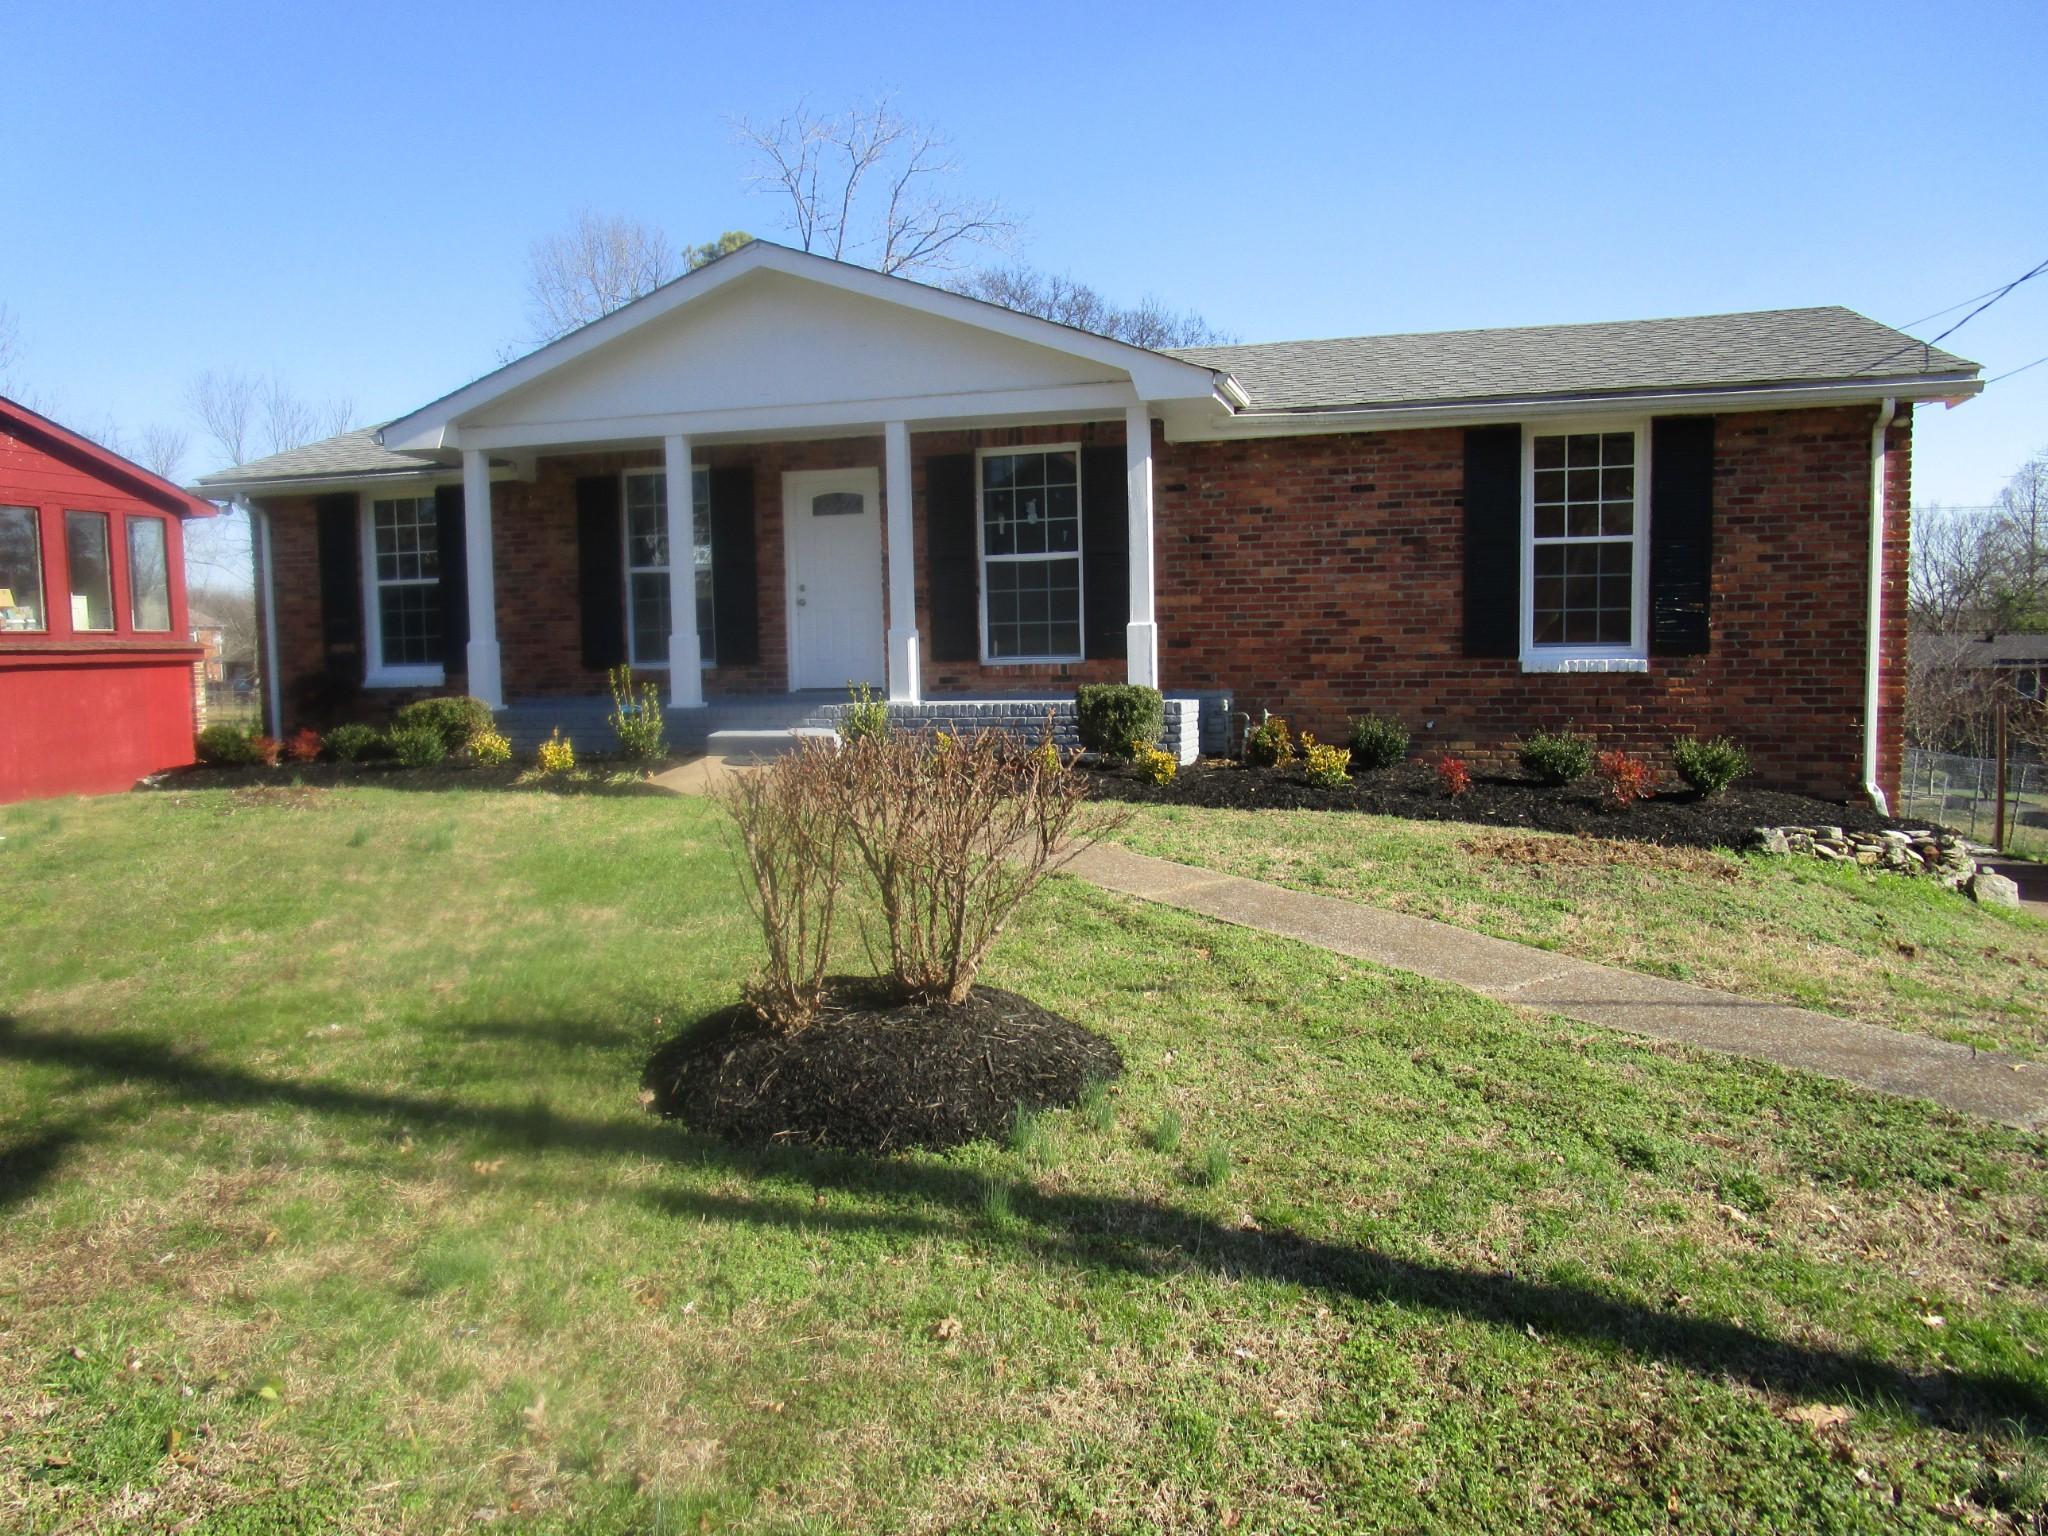 212 Sailboat Dr, Nashville, TN 37217 - Nashville, TN real estate listing